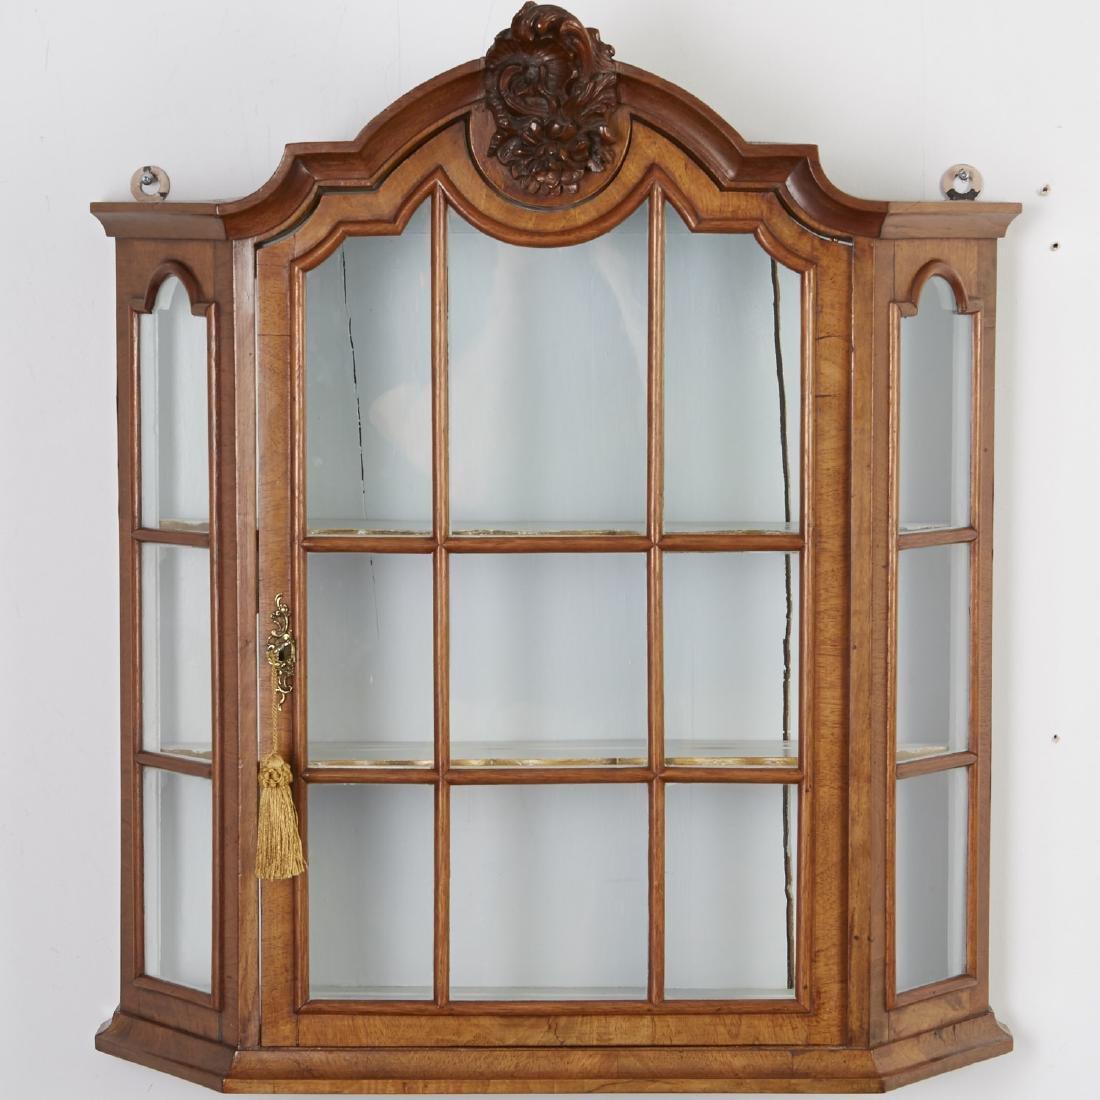 Antique Hanging Display Cabinet